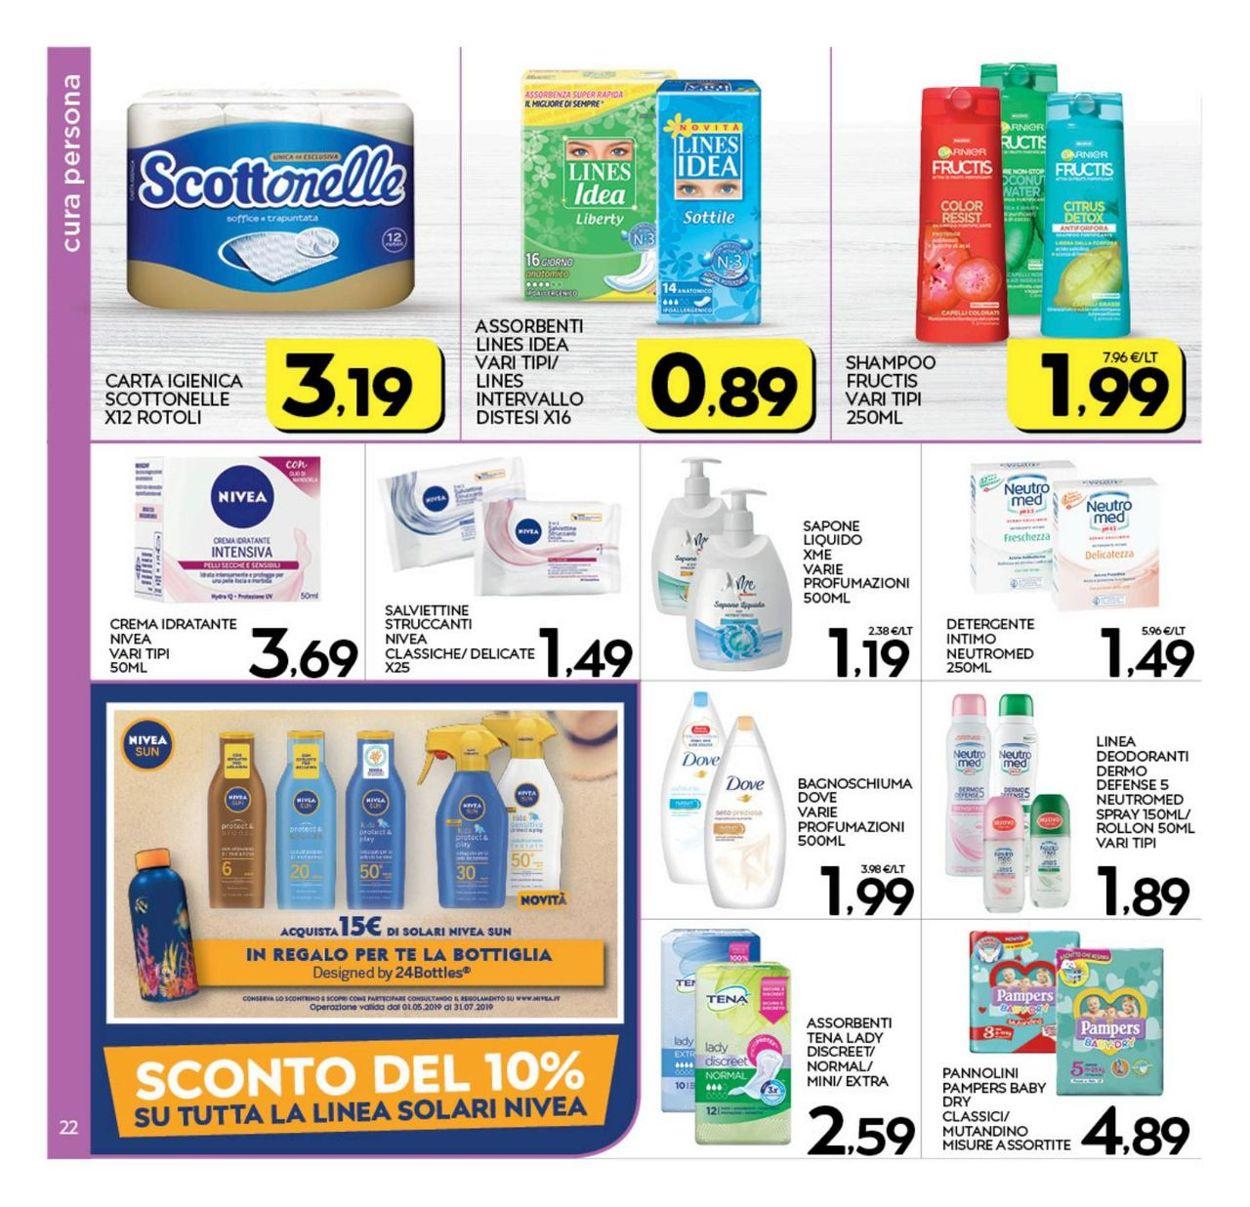 Volantino Interspar - Offerte 27/06-07/07/2019 (Pagina 22)